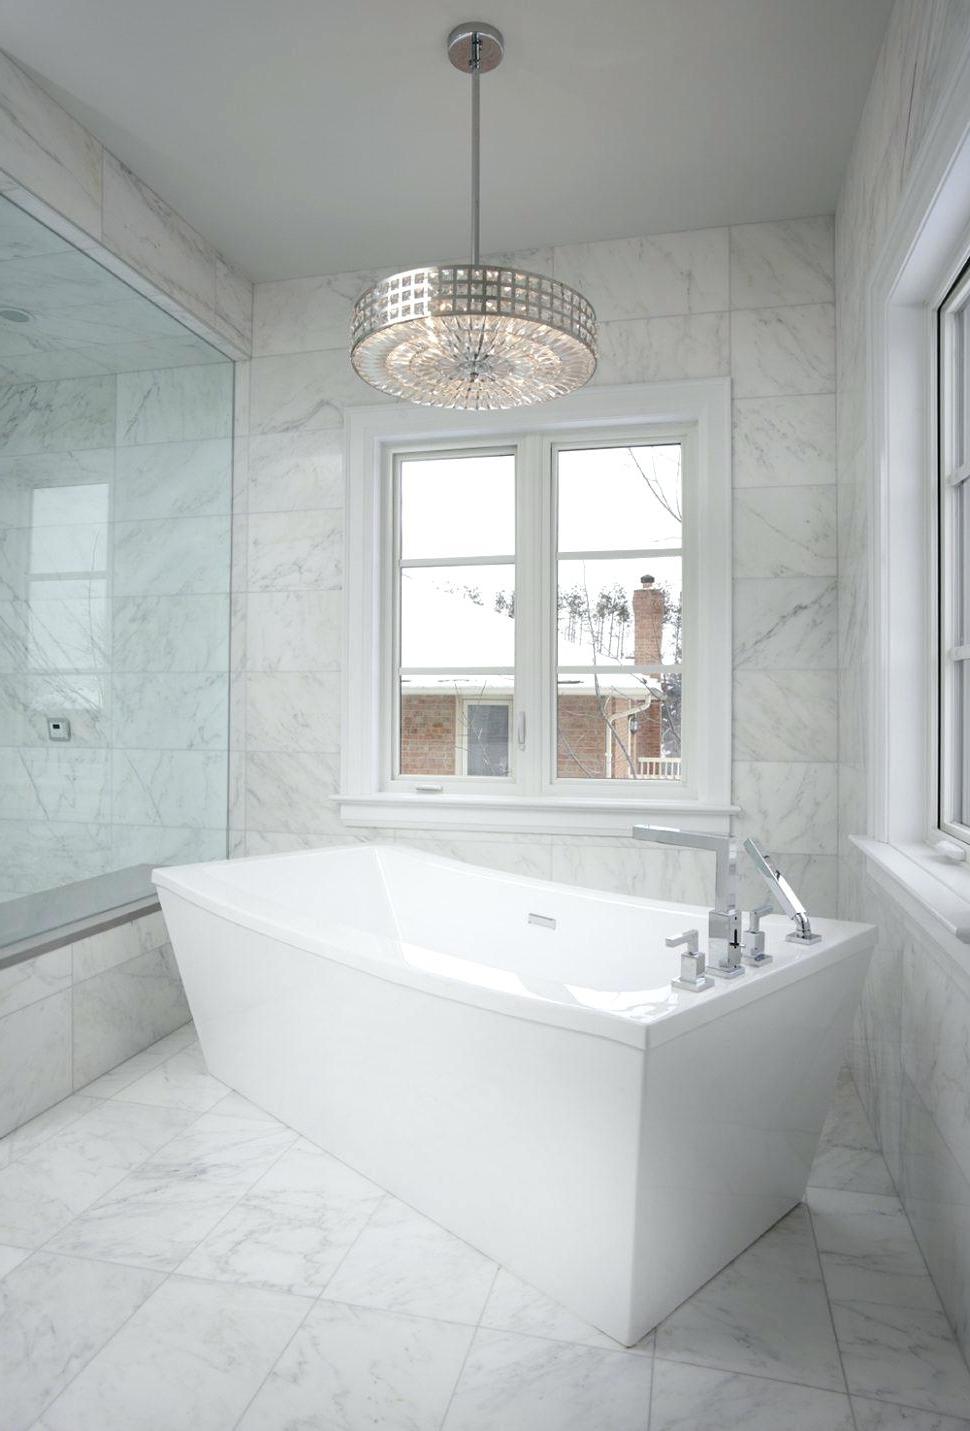 Bathroom Chandelier Lighting Within Popular Bathroom Chandelier Lighting With Tended Lightg Modern Ideas (View 5 of 20)